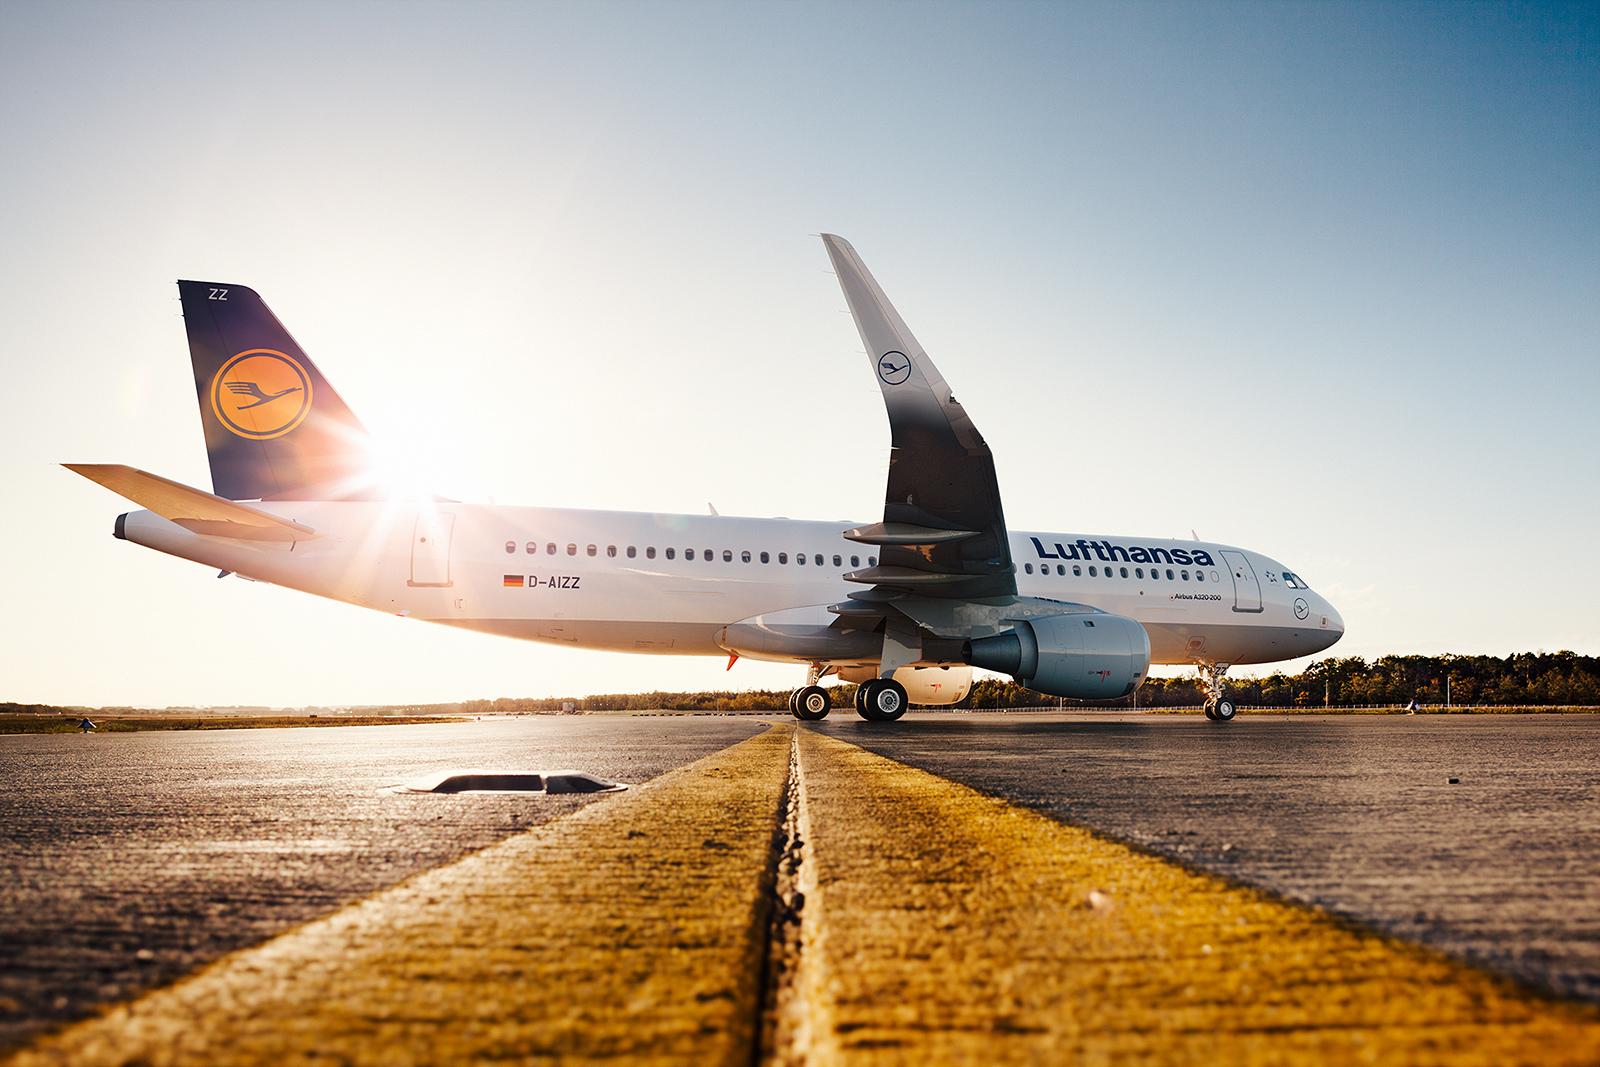 Lufthansa A320 images by Marcin Gruszczyk